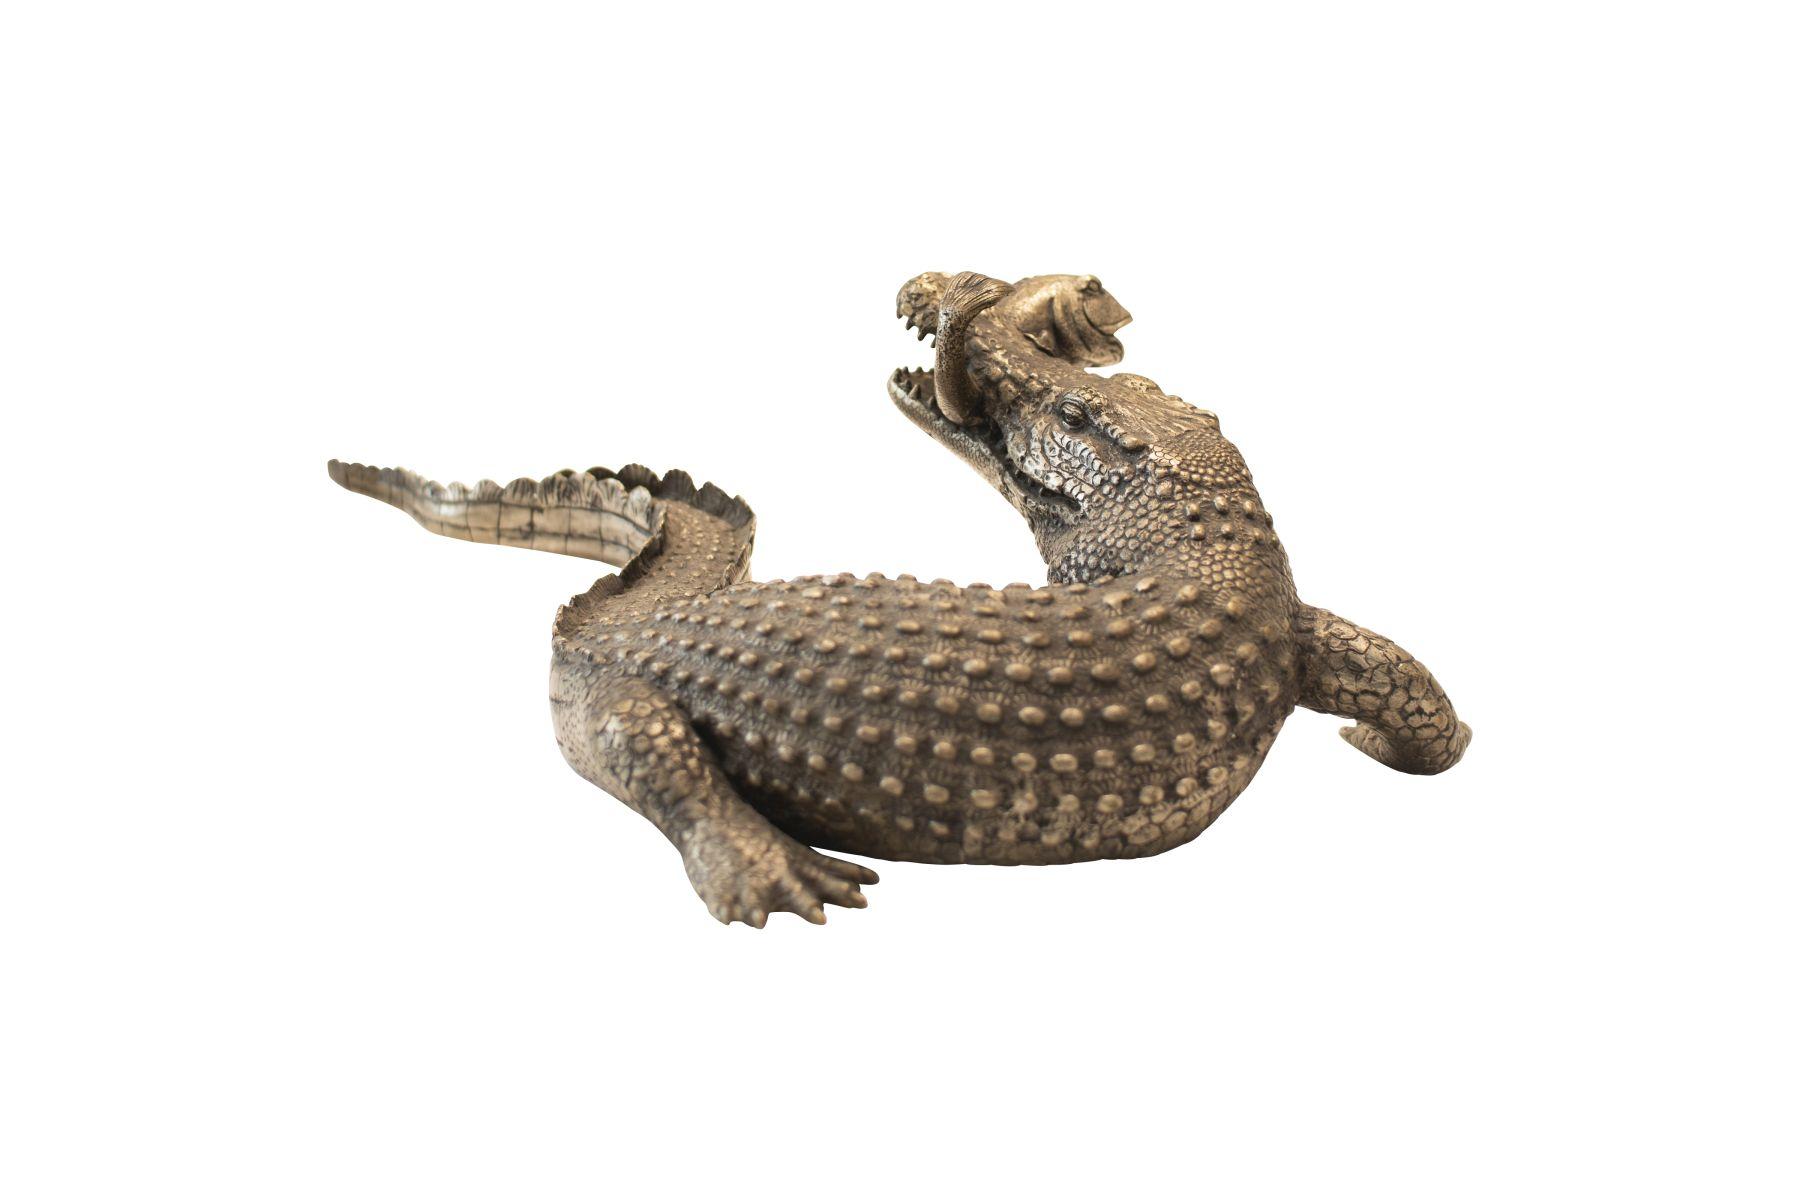 #209 Large Sculpture, Fish-Catching Crocodile   Große Skulptur, Fisch fangendes Krokodil Image